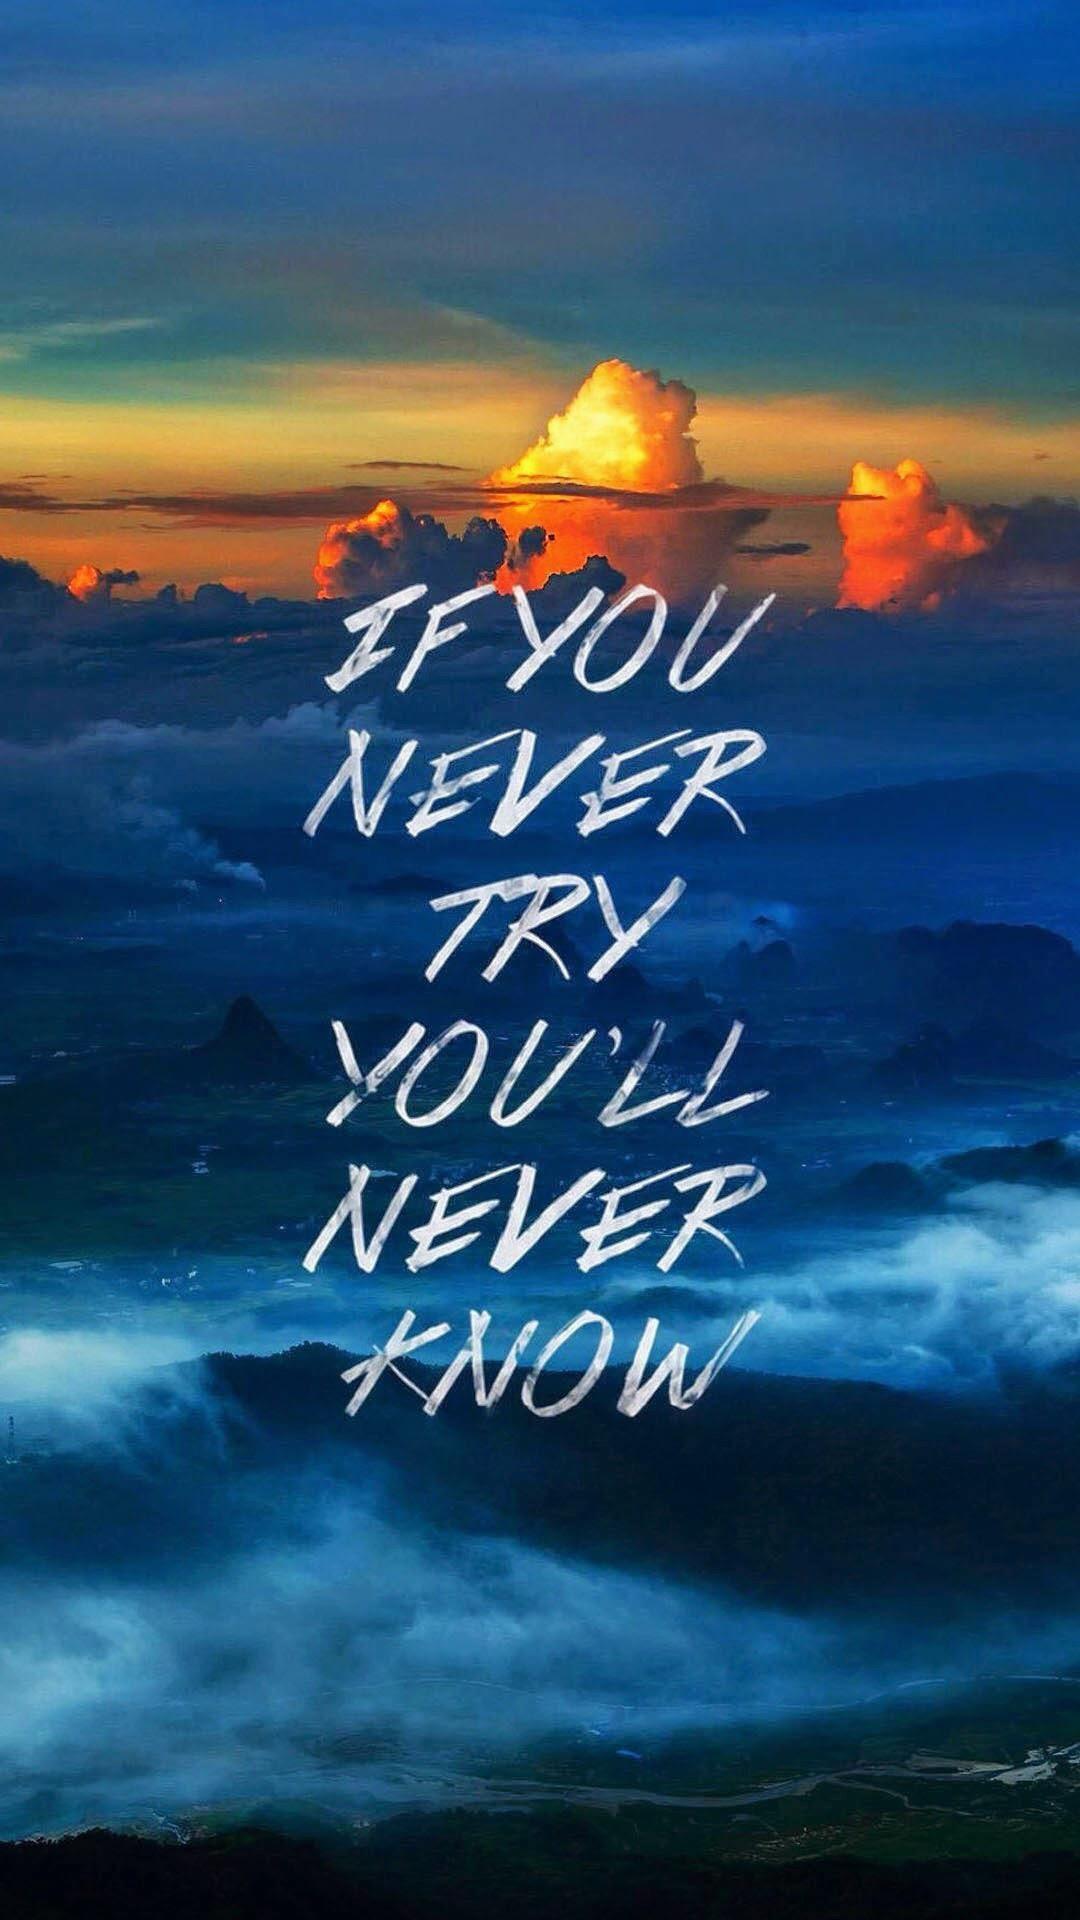 Motivation iPhone 6 Wallpaper 79+ images